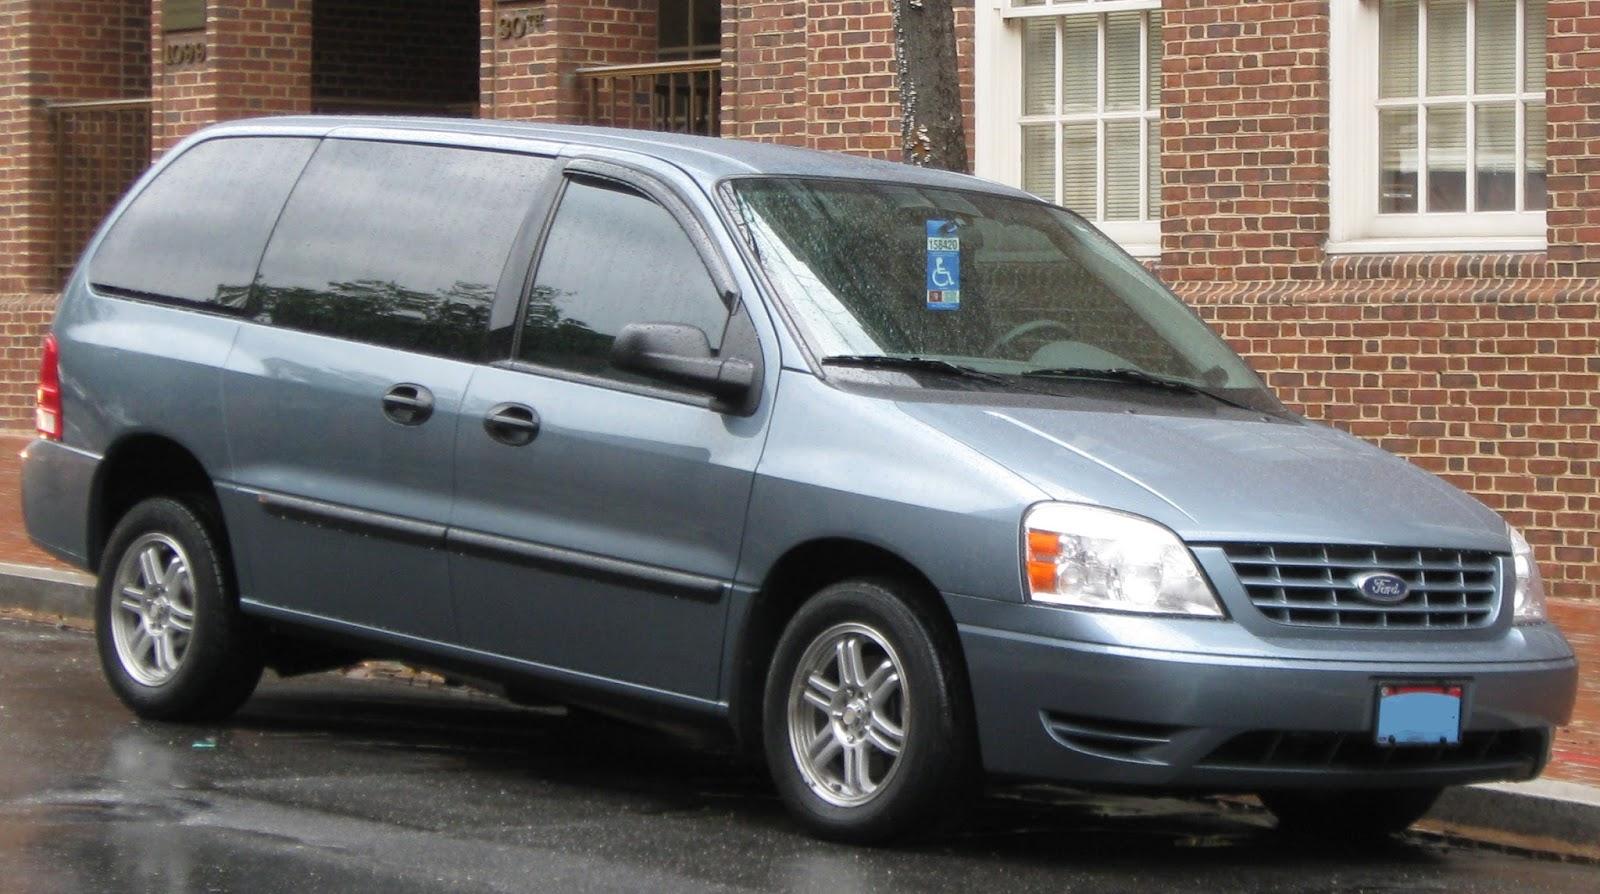 Tunado Loko Carros Ford Windstar